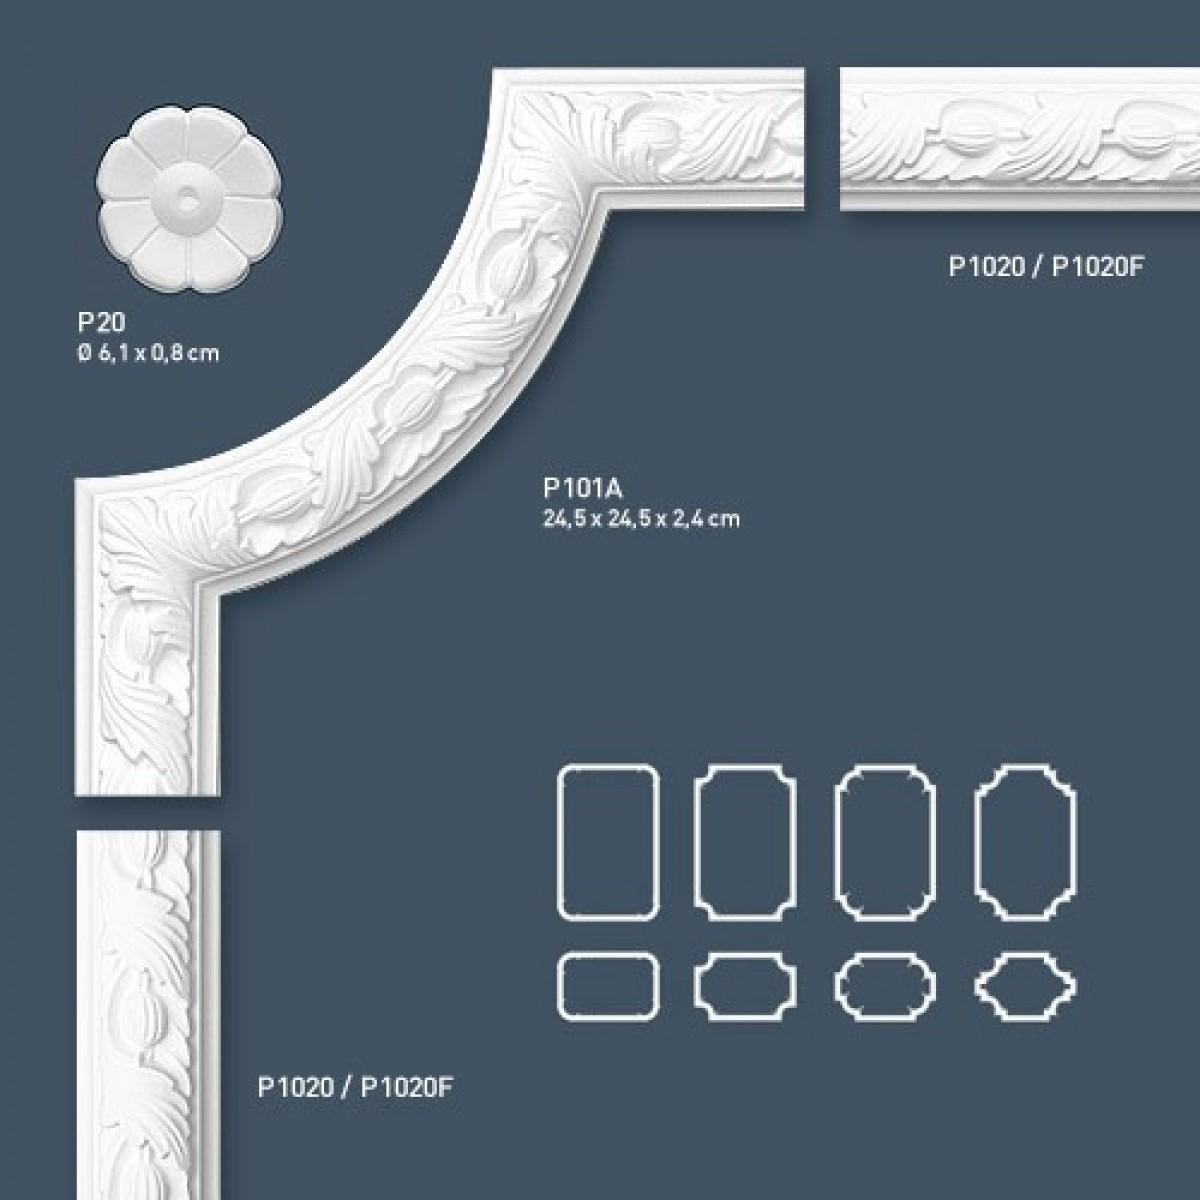 Brau Flex Luxxus P1020F, Dimensiuni: 200 X 4.9 X 2.4 cm, Orac Decor